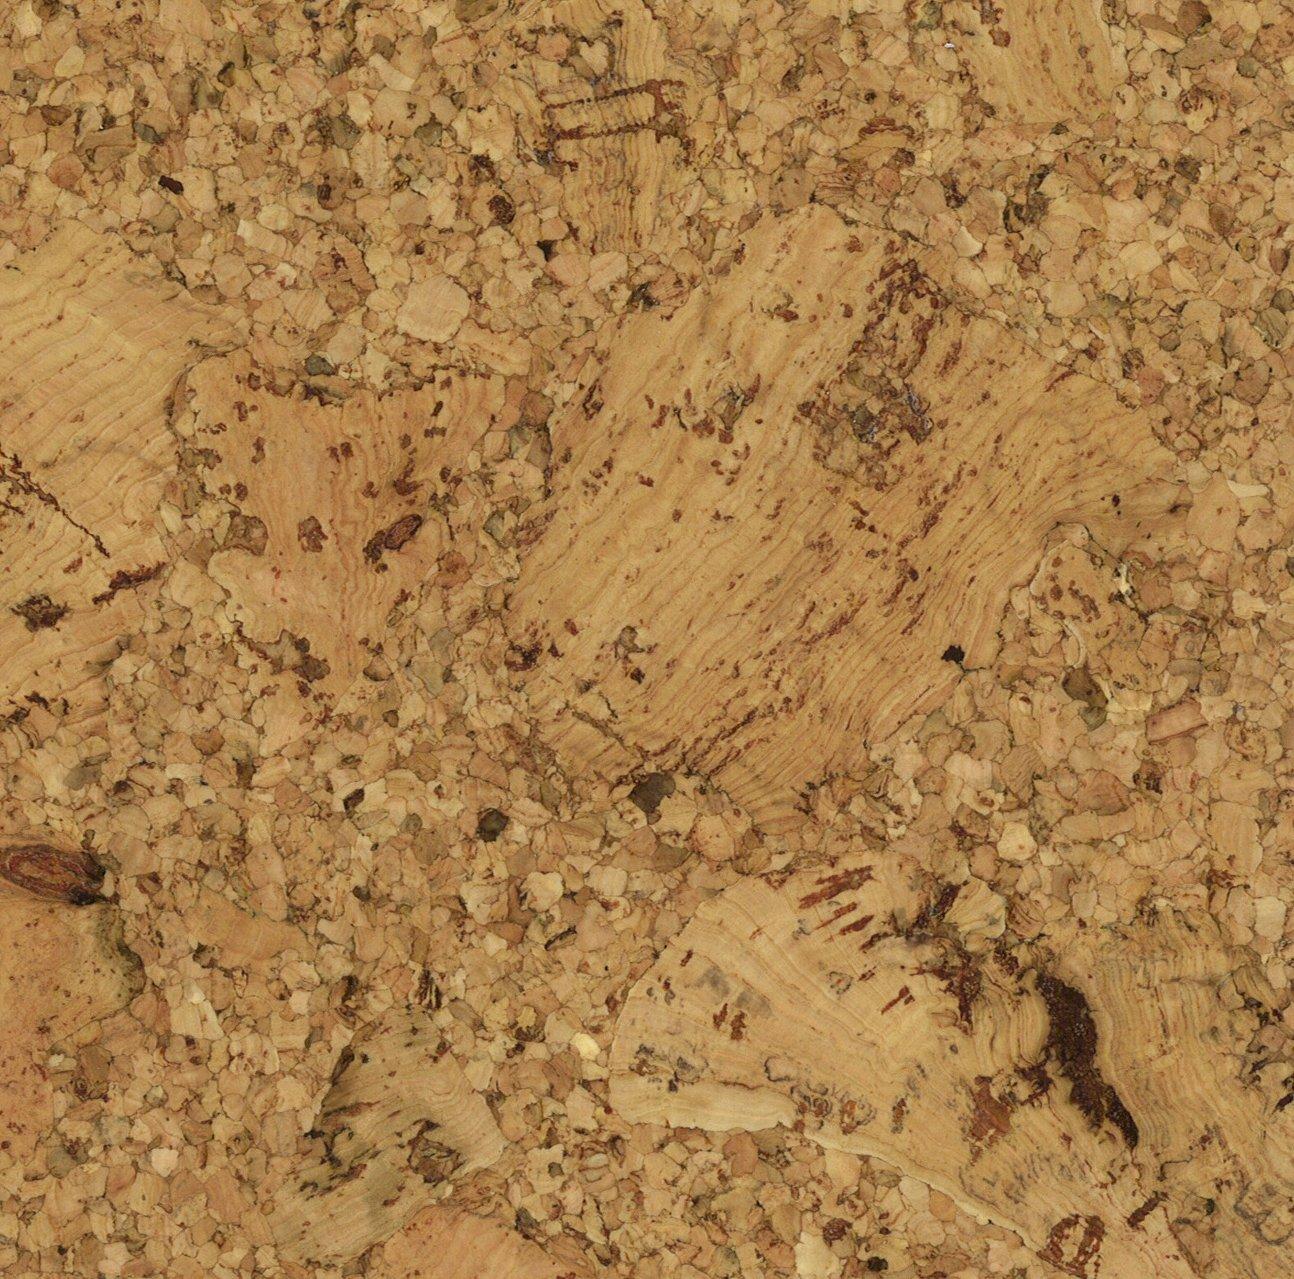 Wicanders seville xtec cork flooring sample bamboo carmel wood wicanders seville xtec cork flooring sample bamboo carmel wood floor coverings amazon dailygadgetfo Images